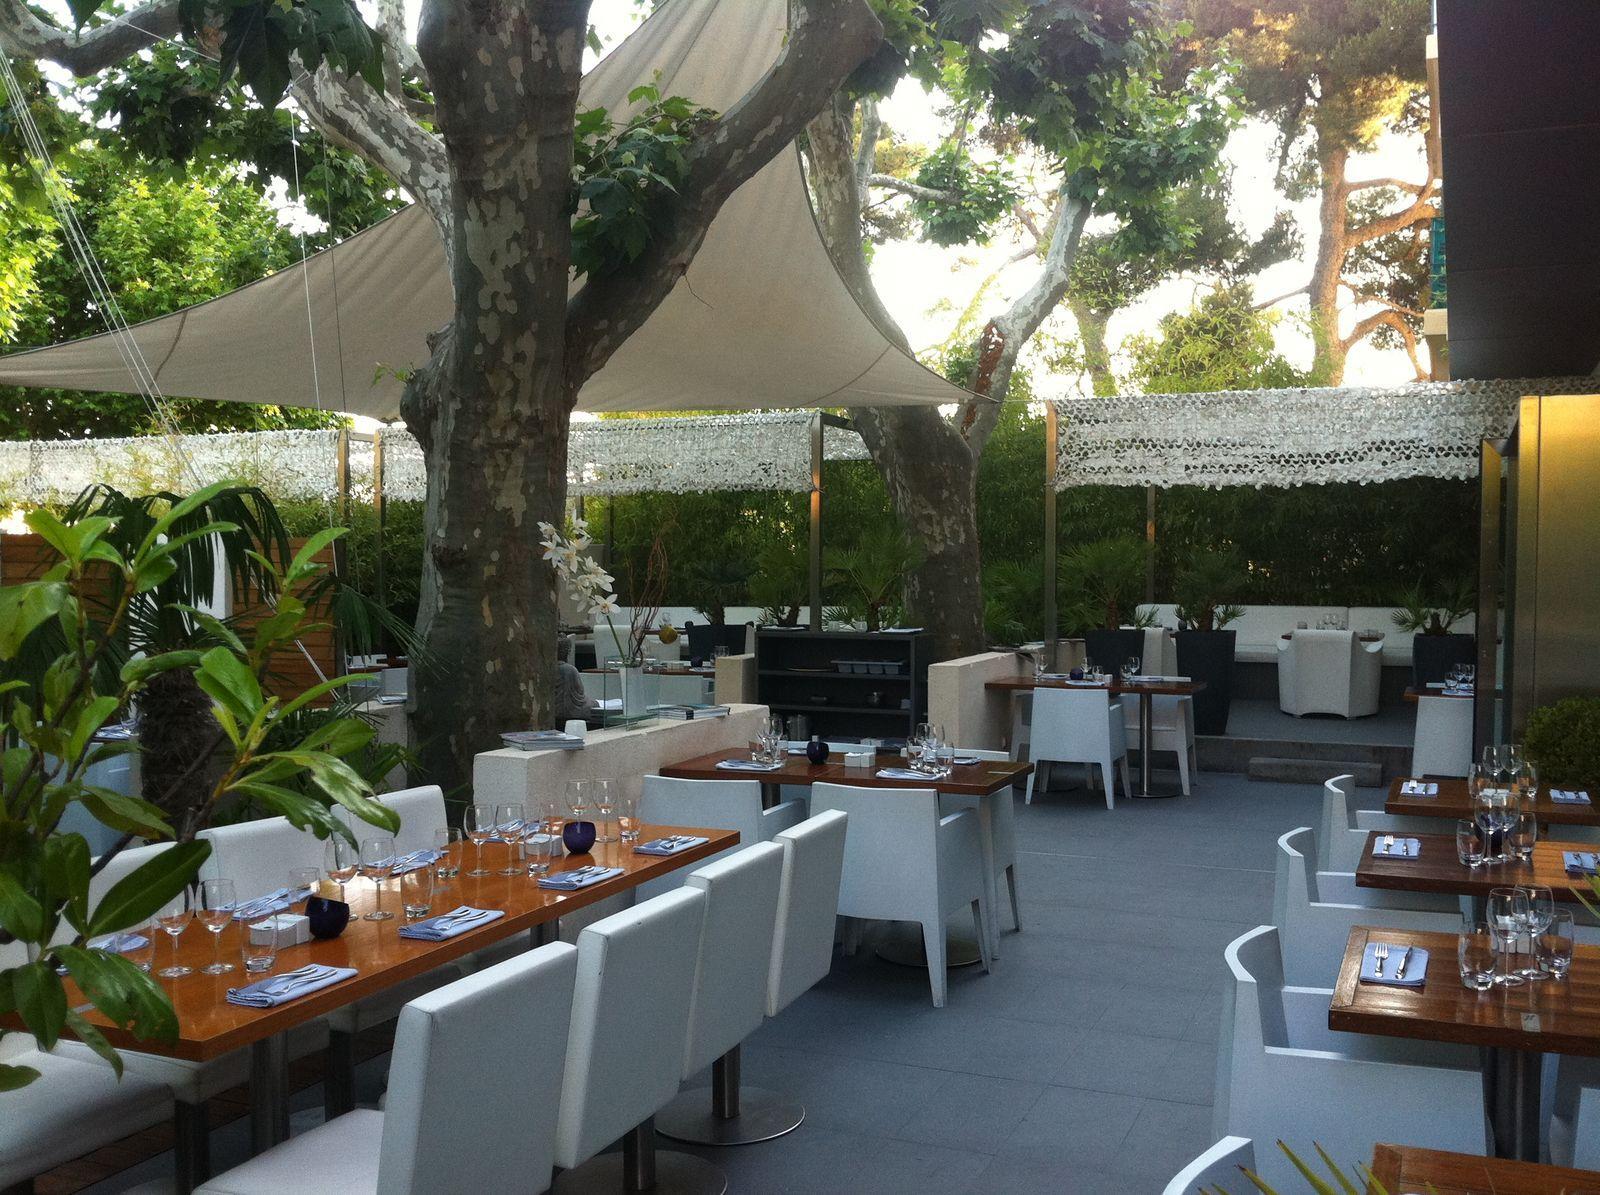 Captivating Aix En Provence. Terrace At Les2Frères Restaurant. Founded 2001